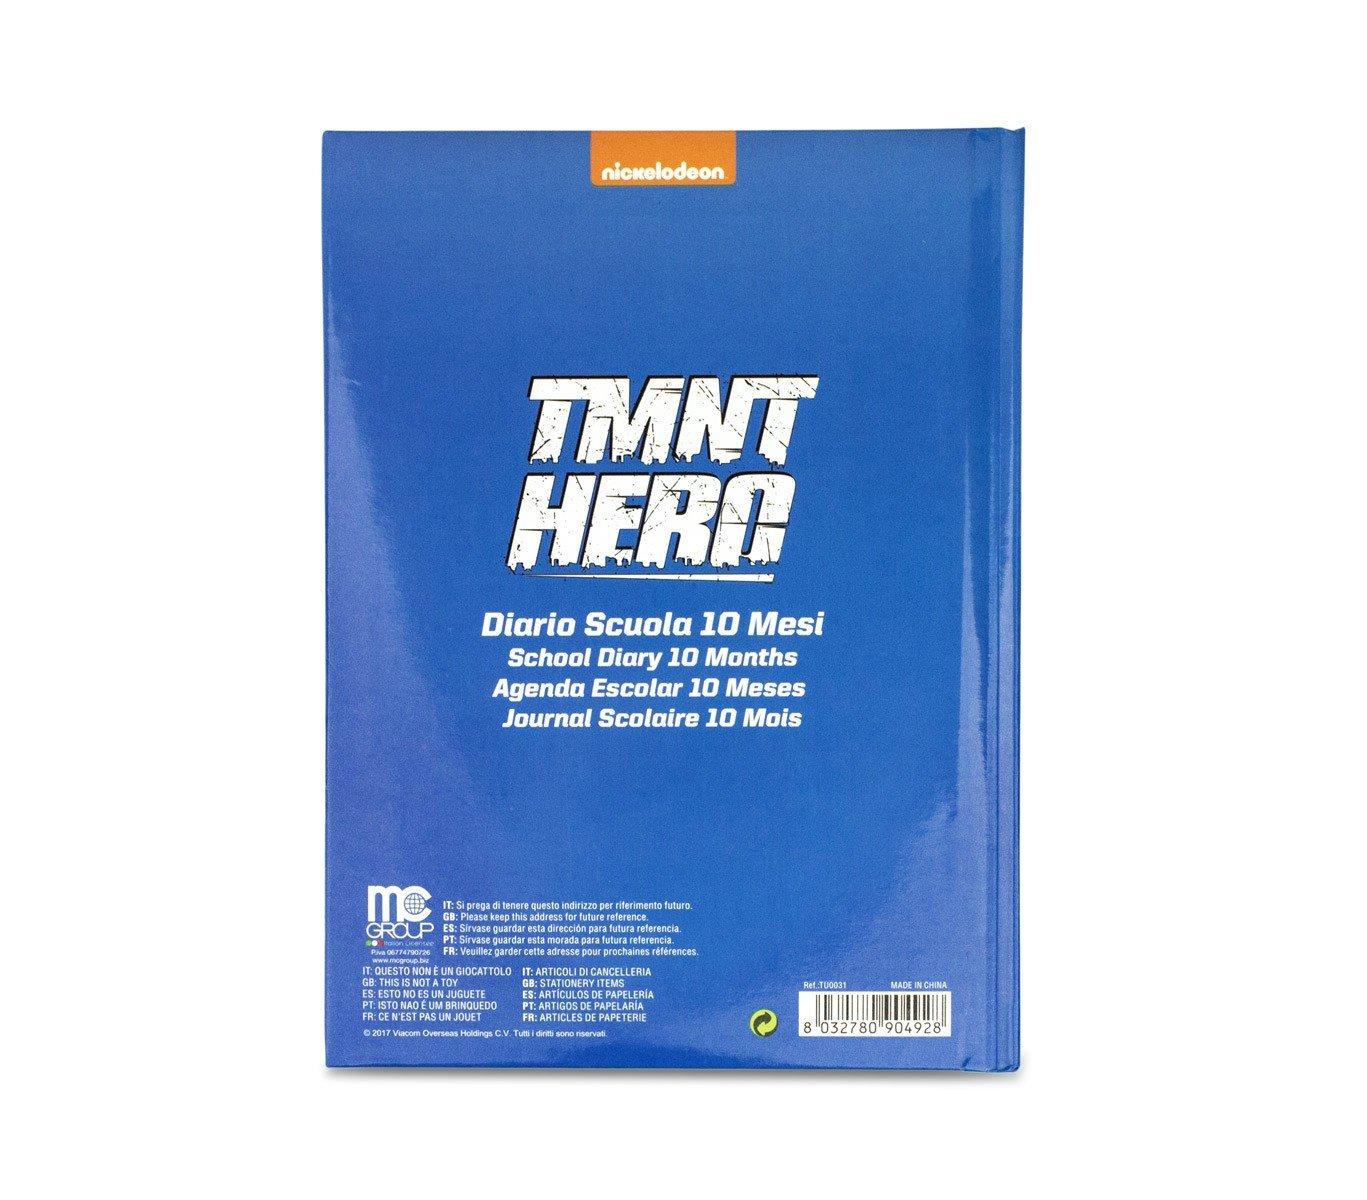 904928 Agenda 10 meses para el colegio TURTLES TMNT HERO ...